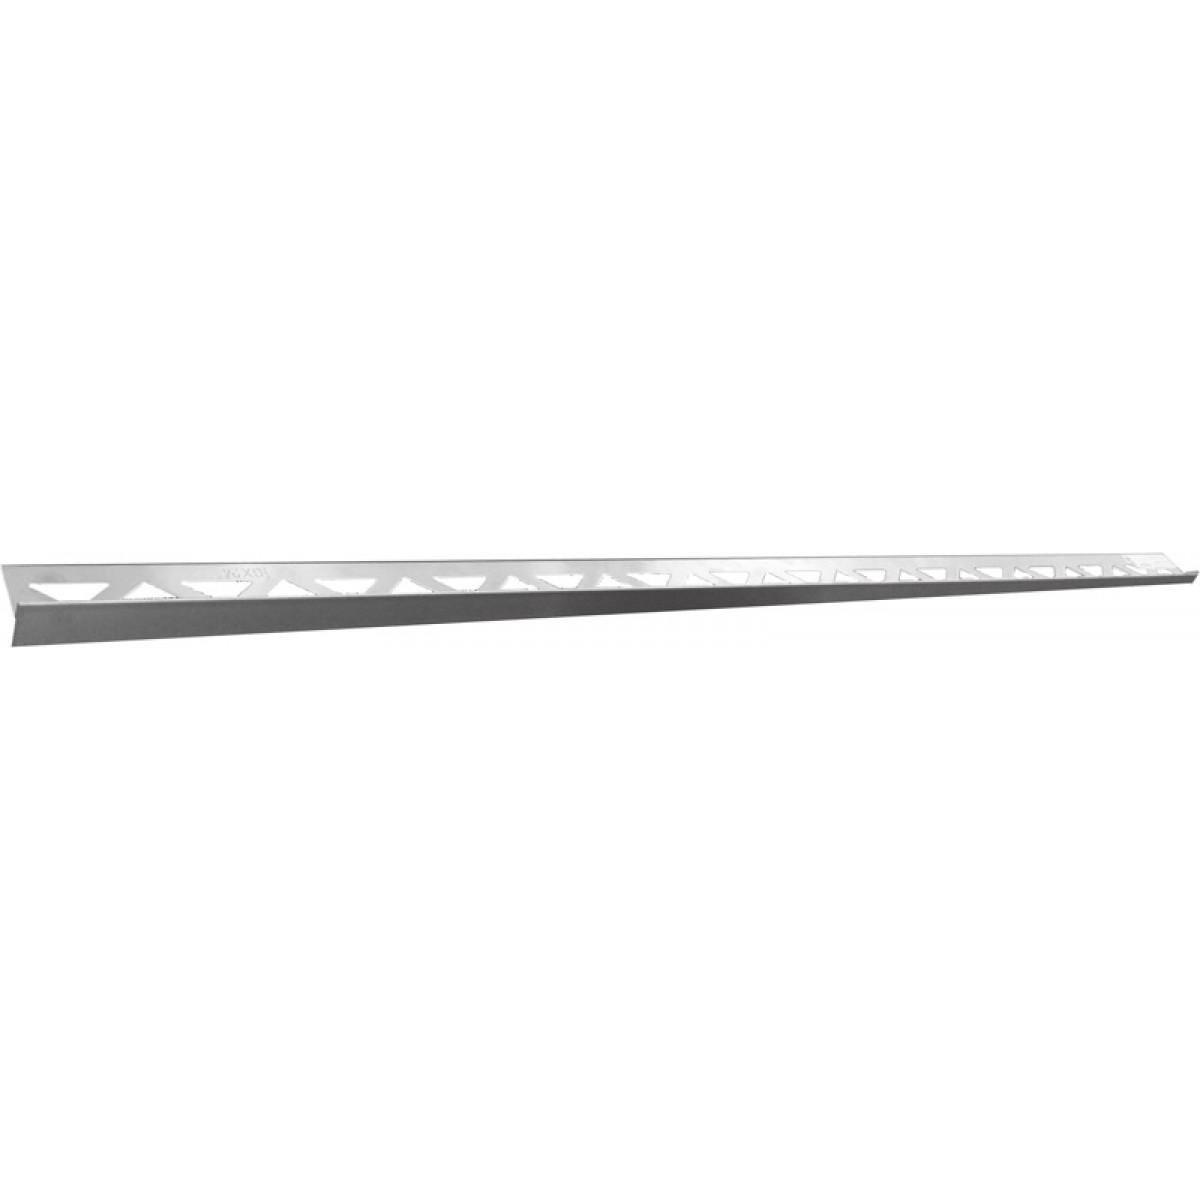 Edelstahl-Duschprofil mit Gefälle LINKS FE-DP 98-8-24 - 8 mm / 98 cm FE-DP 98-8-24  -  8 mm / 98 cm Länge